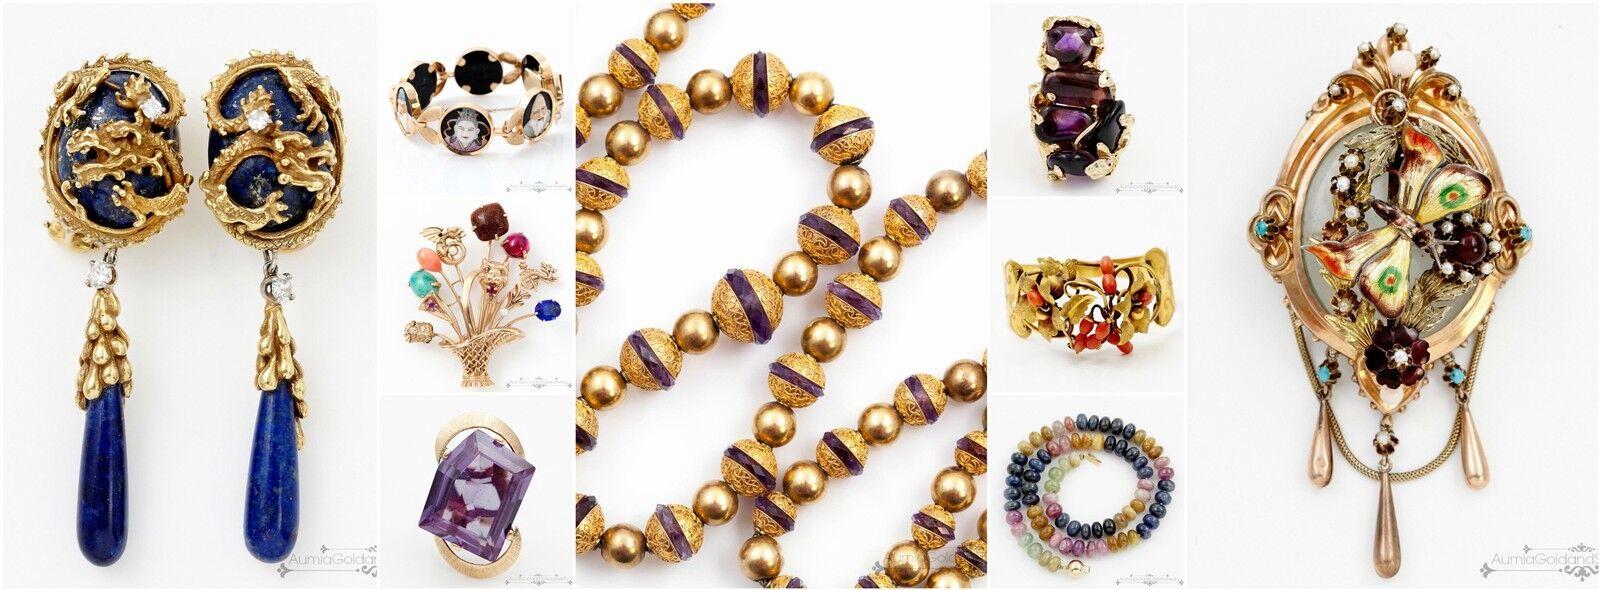 Aumia Gold Silver Jewelry